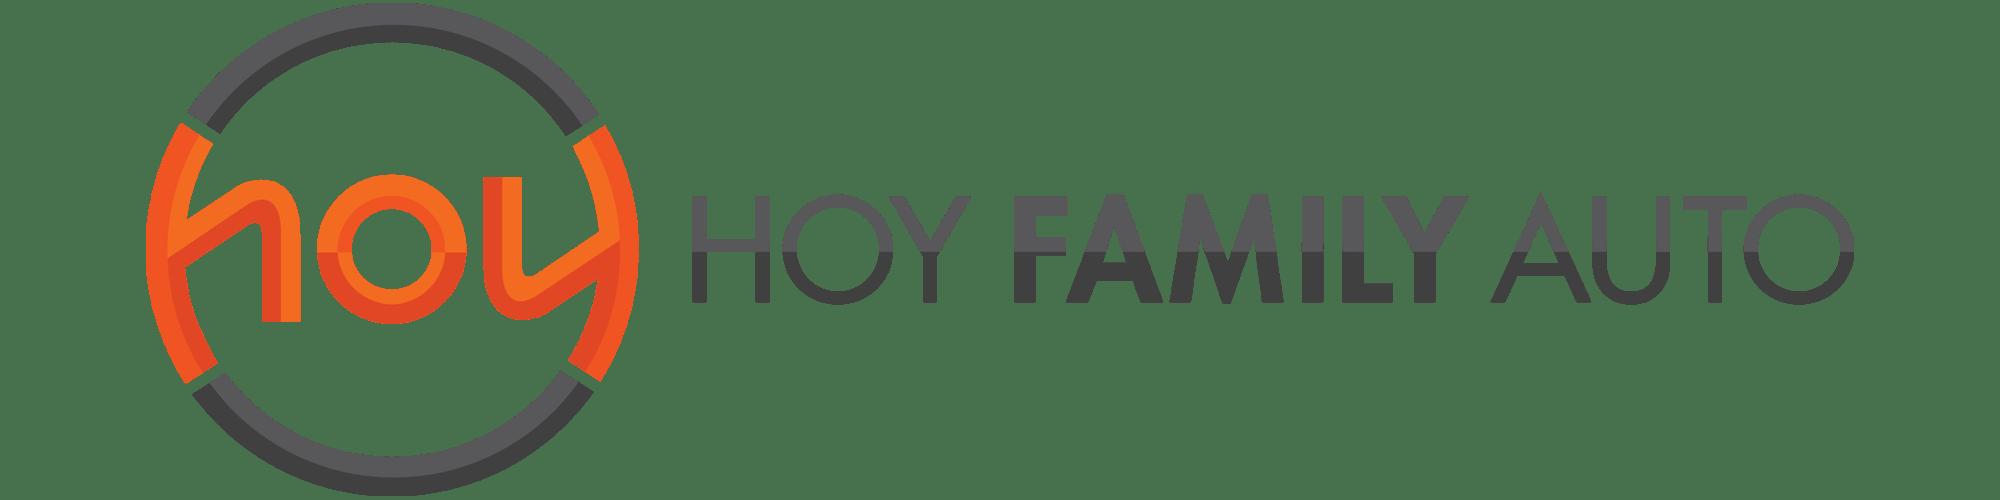 Satisfied New Car Customers in El Paso, Texas | Hoy Family